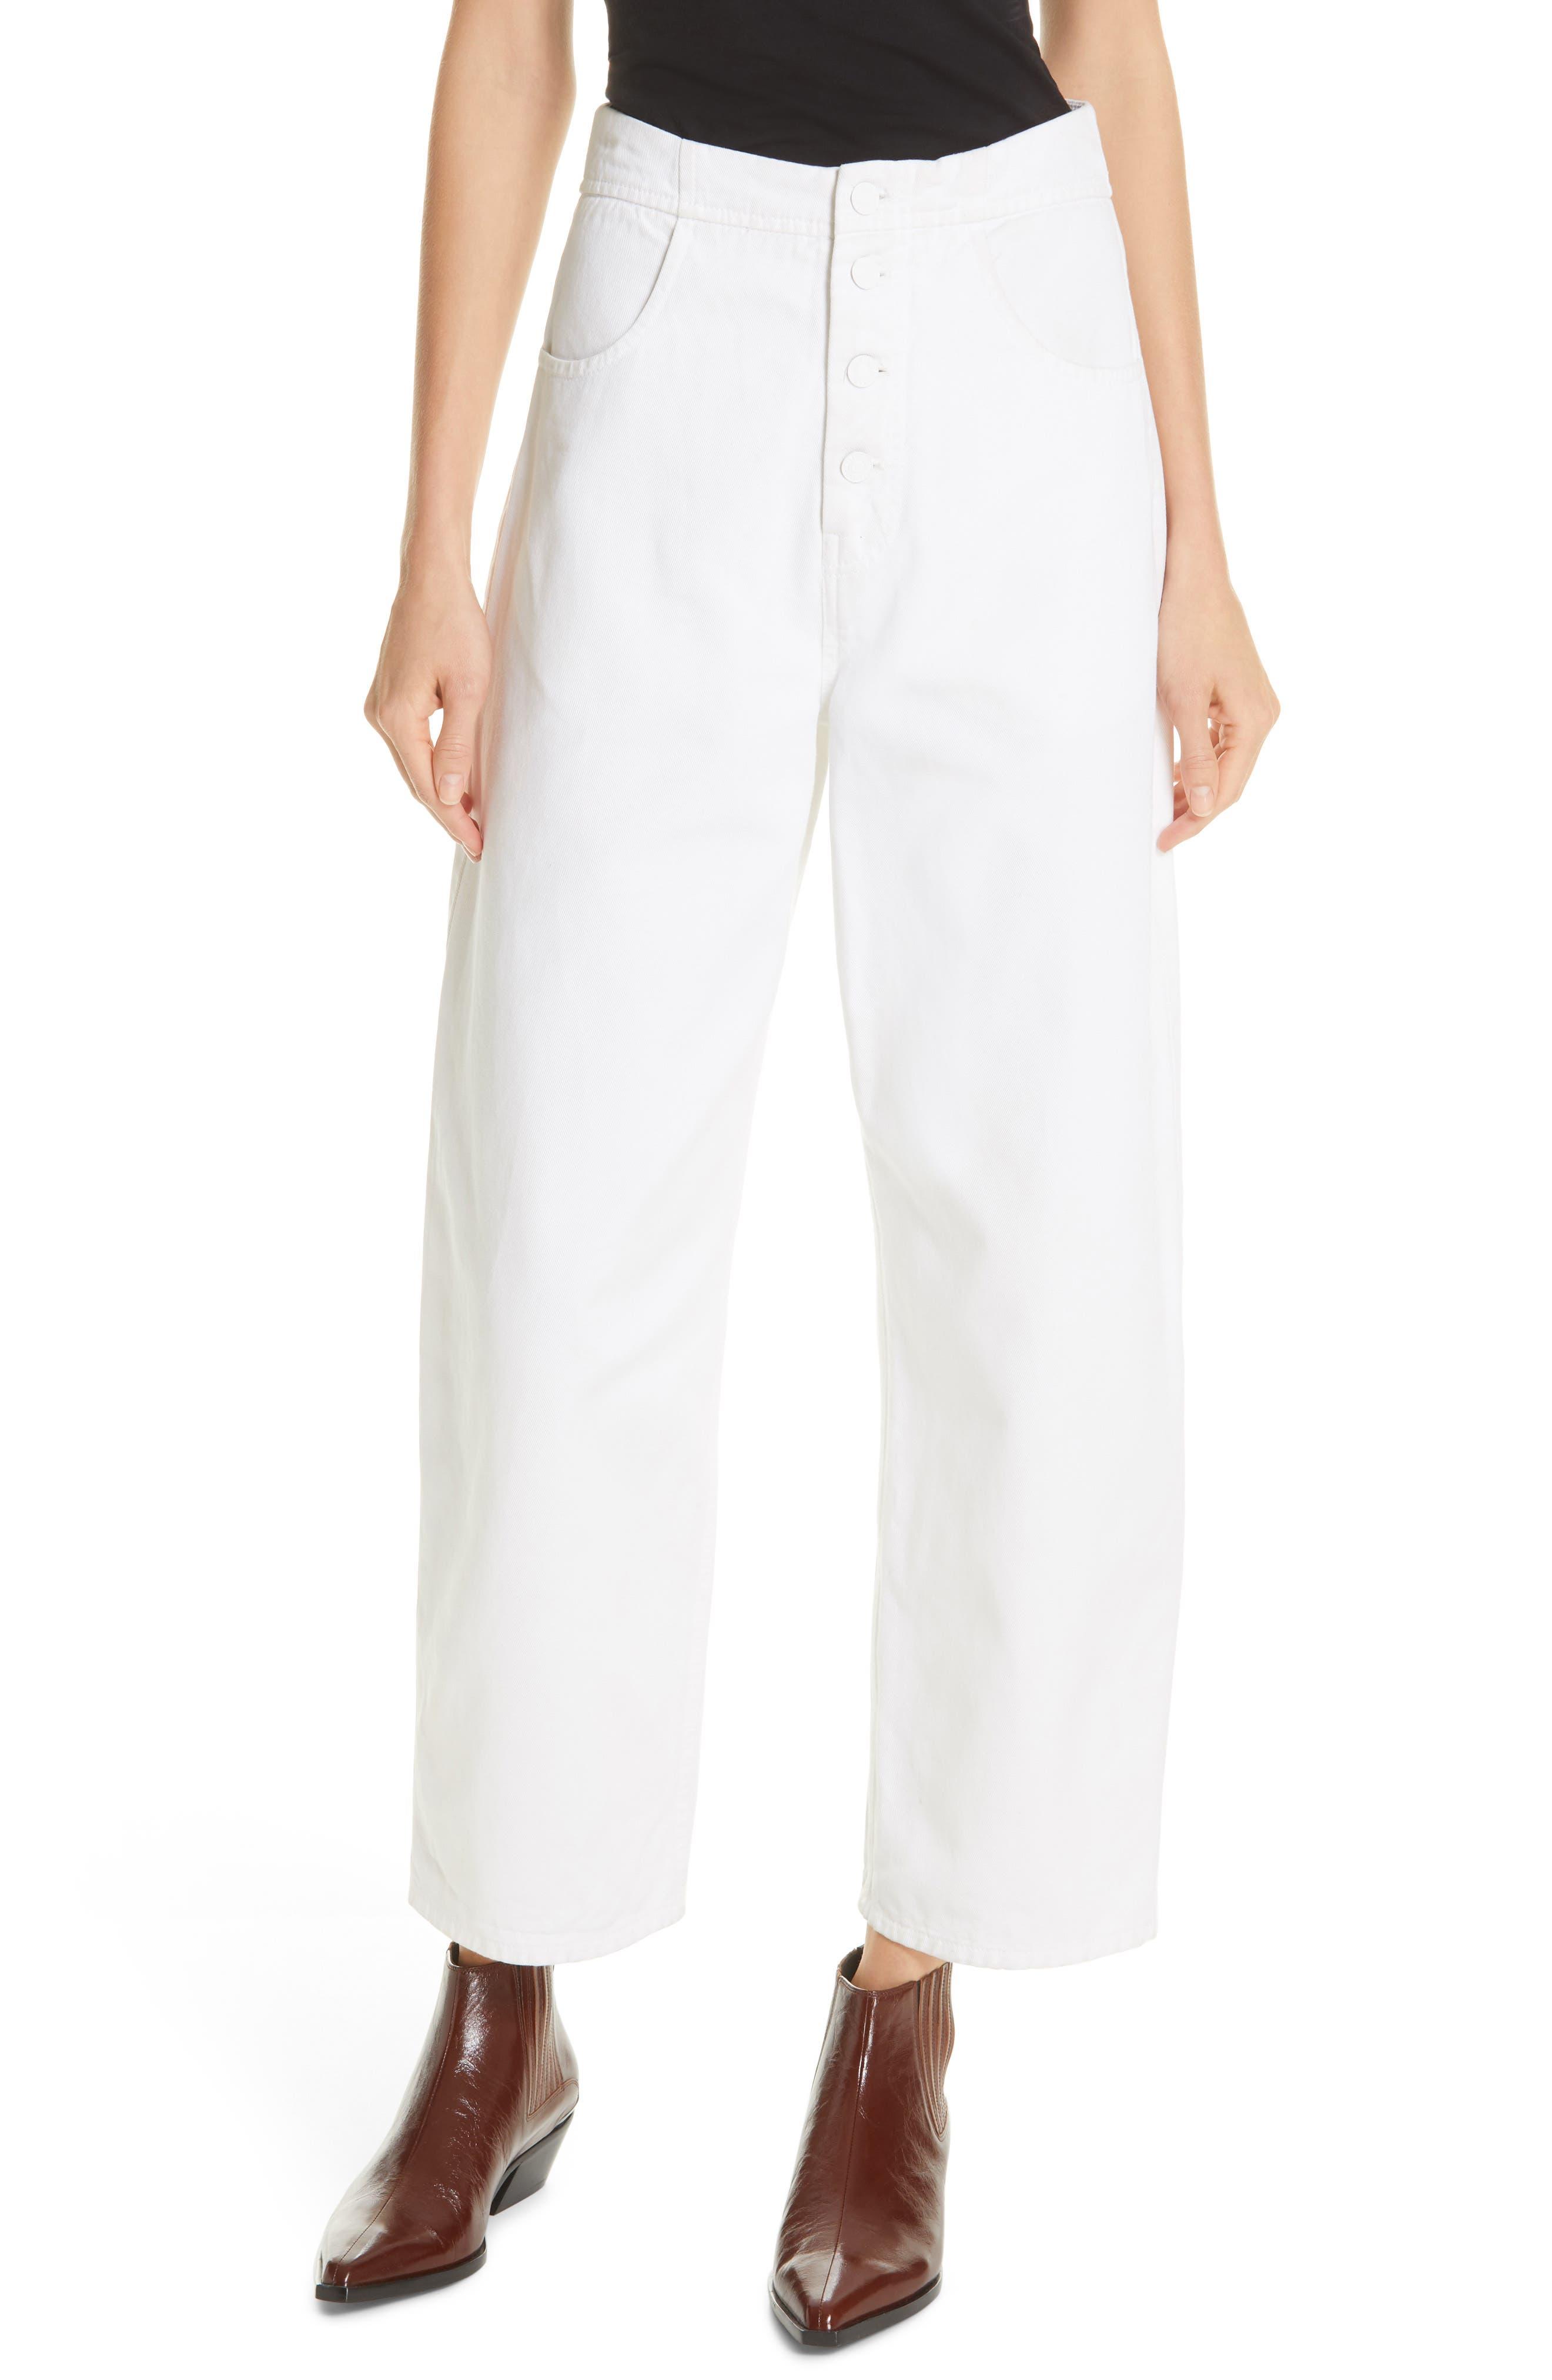 NILI LOTAN Toledo Crop Cotton Pants, Main, color, VINTAGE WHITE